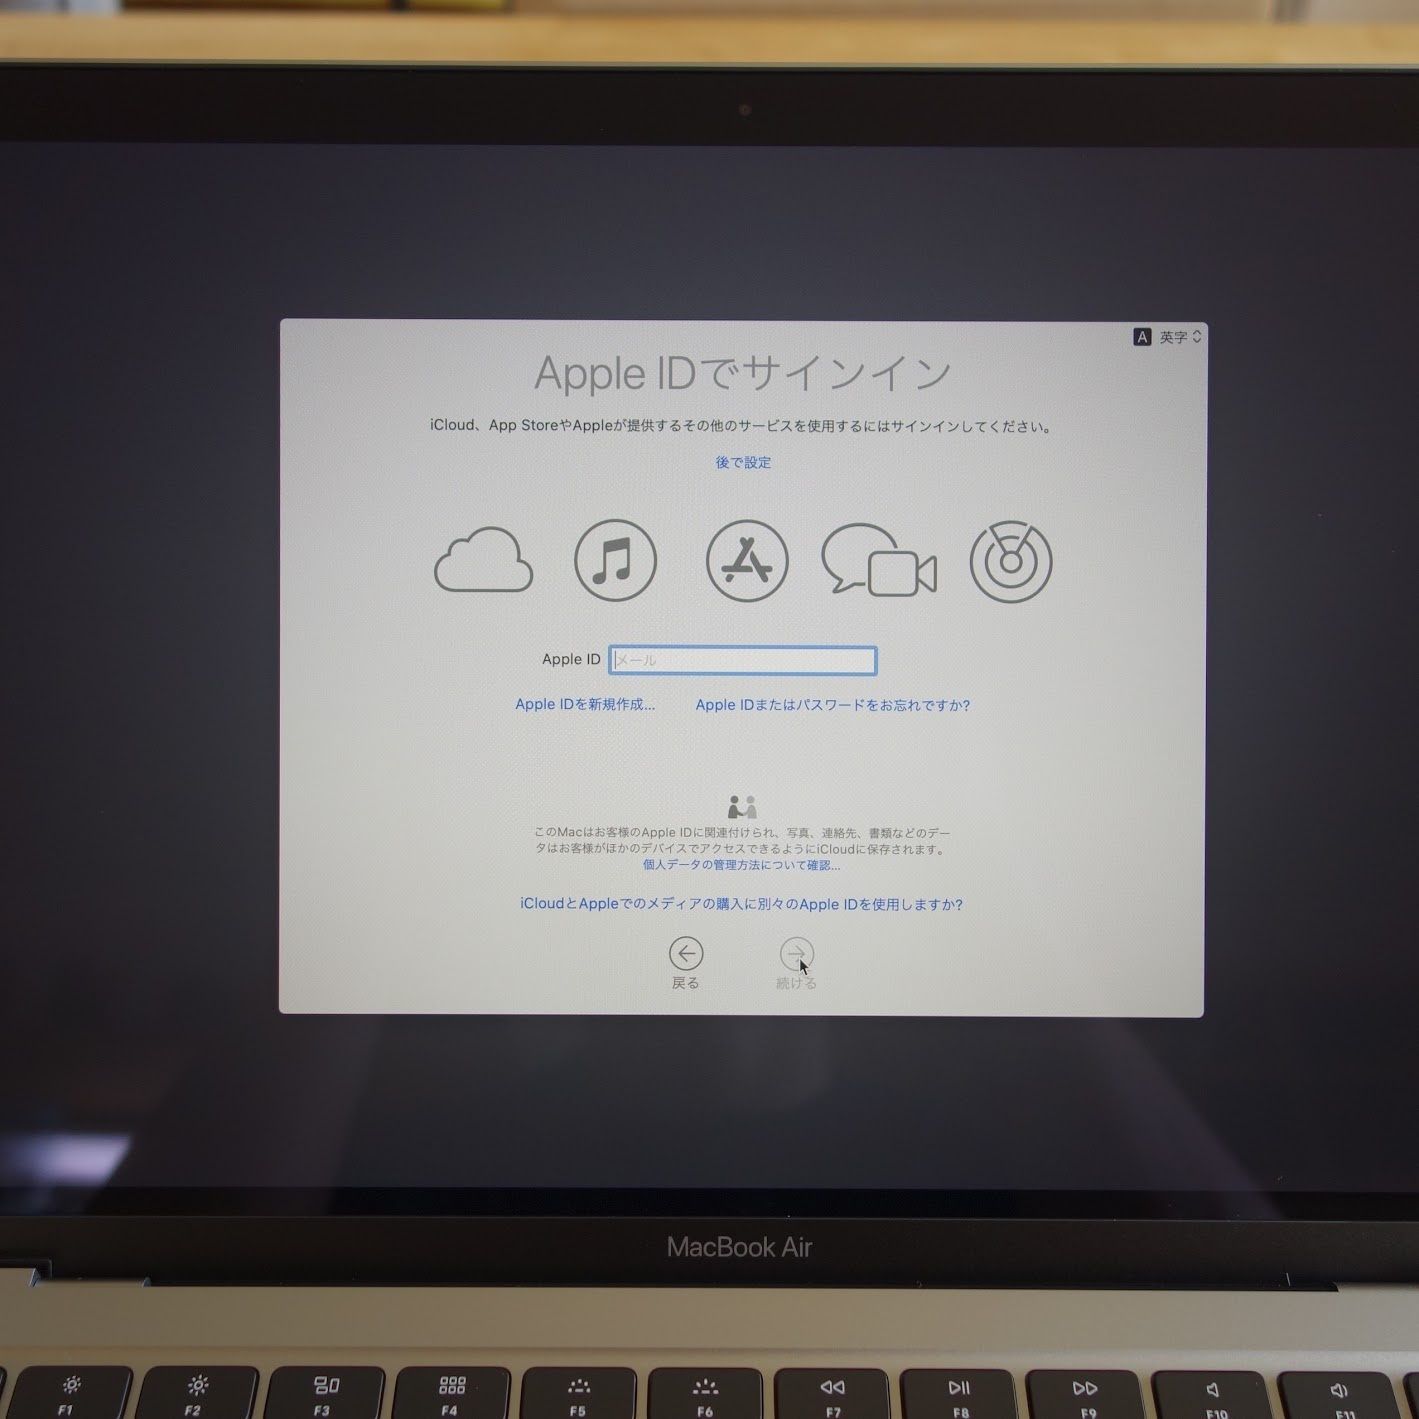 MacBook Air AppleIDでサインイン